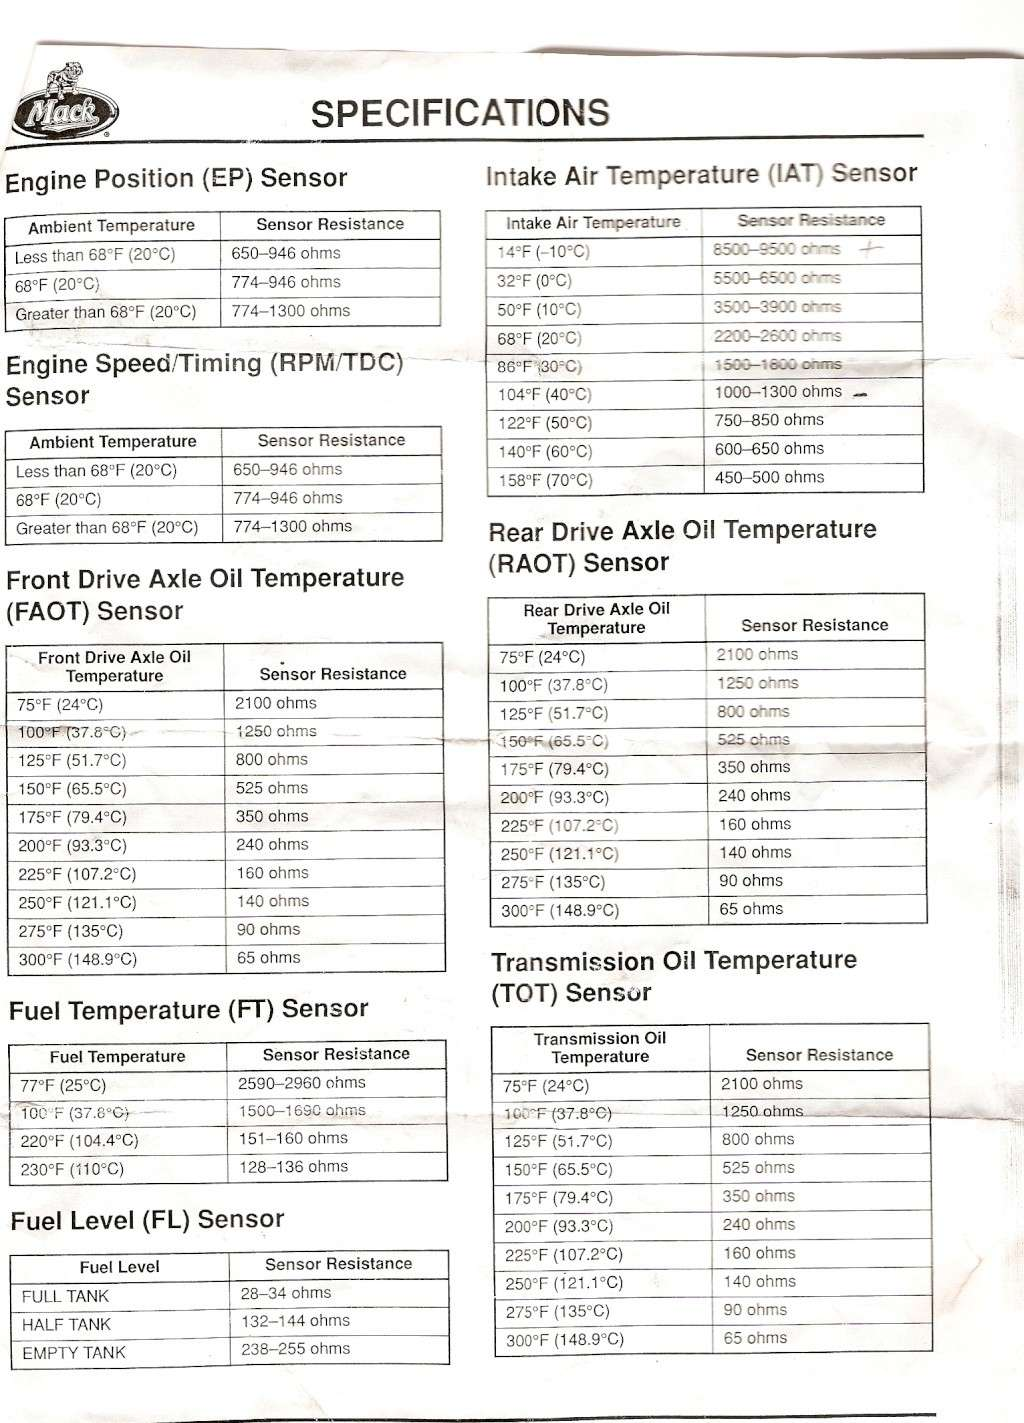 E7 Mack Overhaul manual